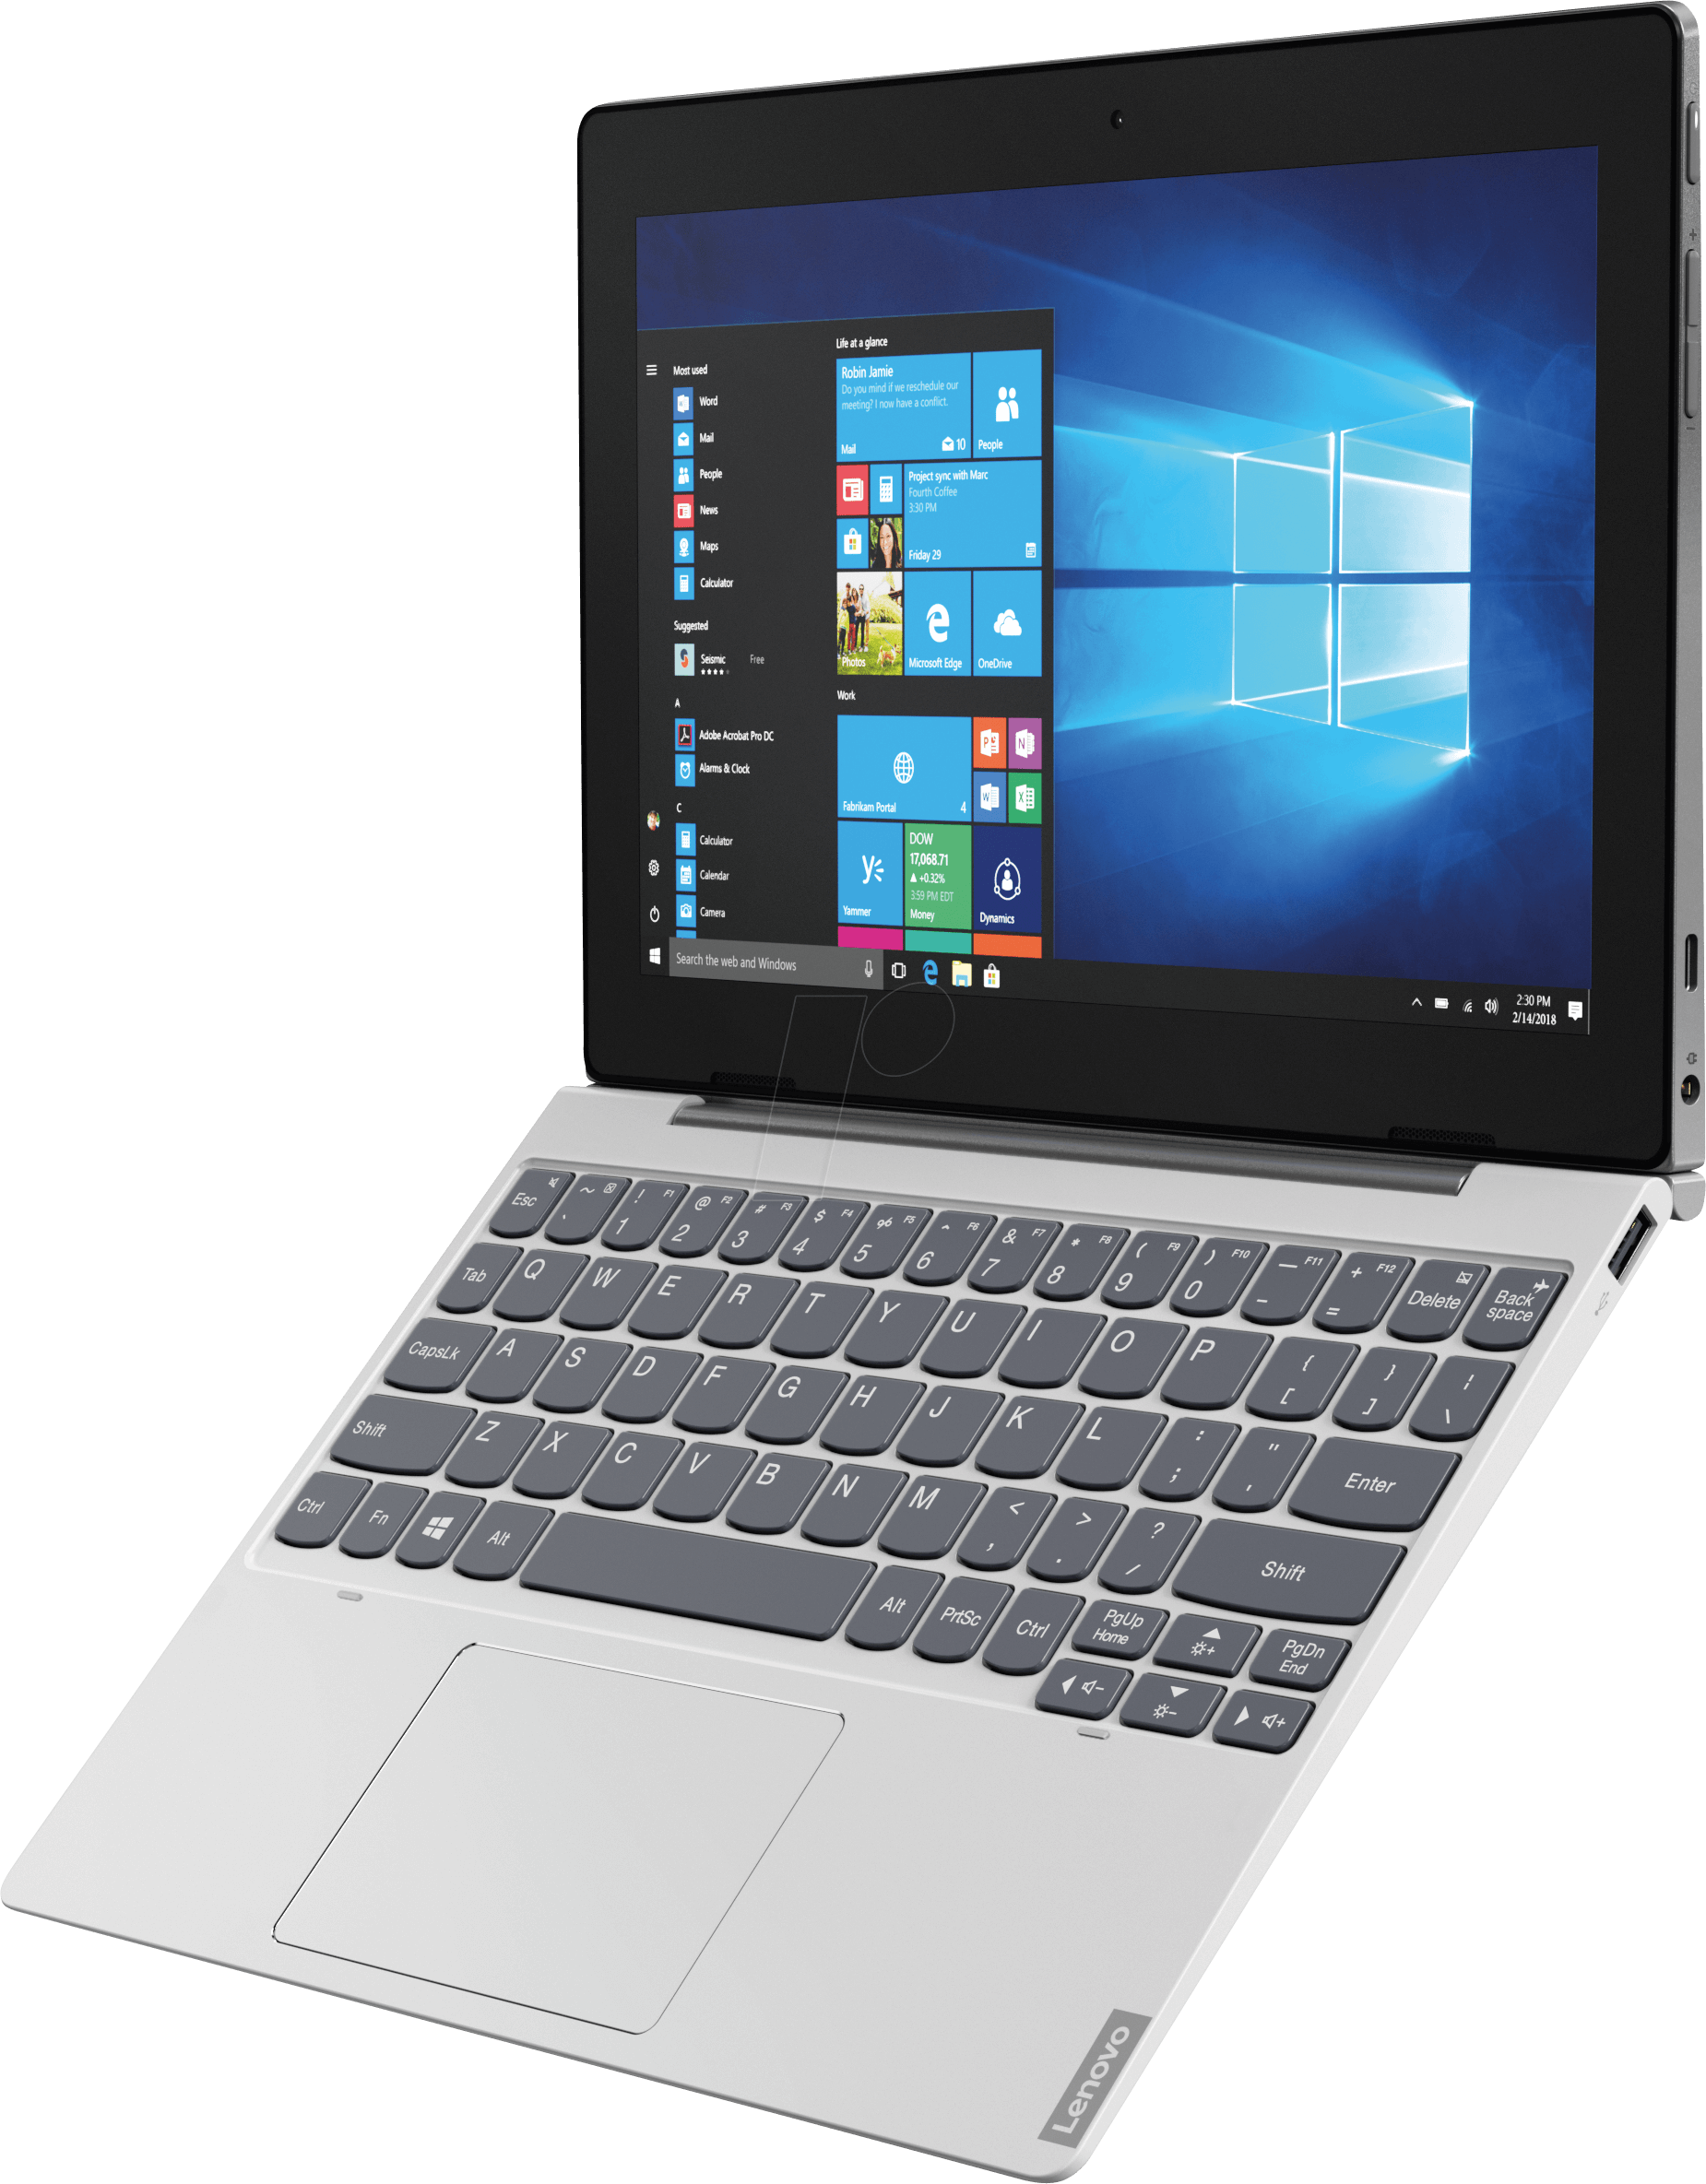 LENOVO 81MD0008 - IdeaPad D330 tablet, 10 1 inches, Windows 10